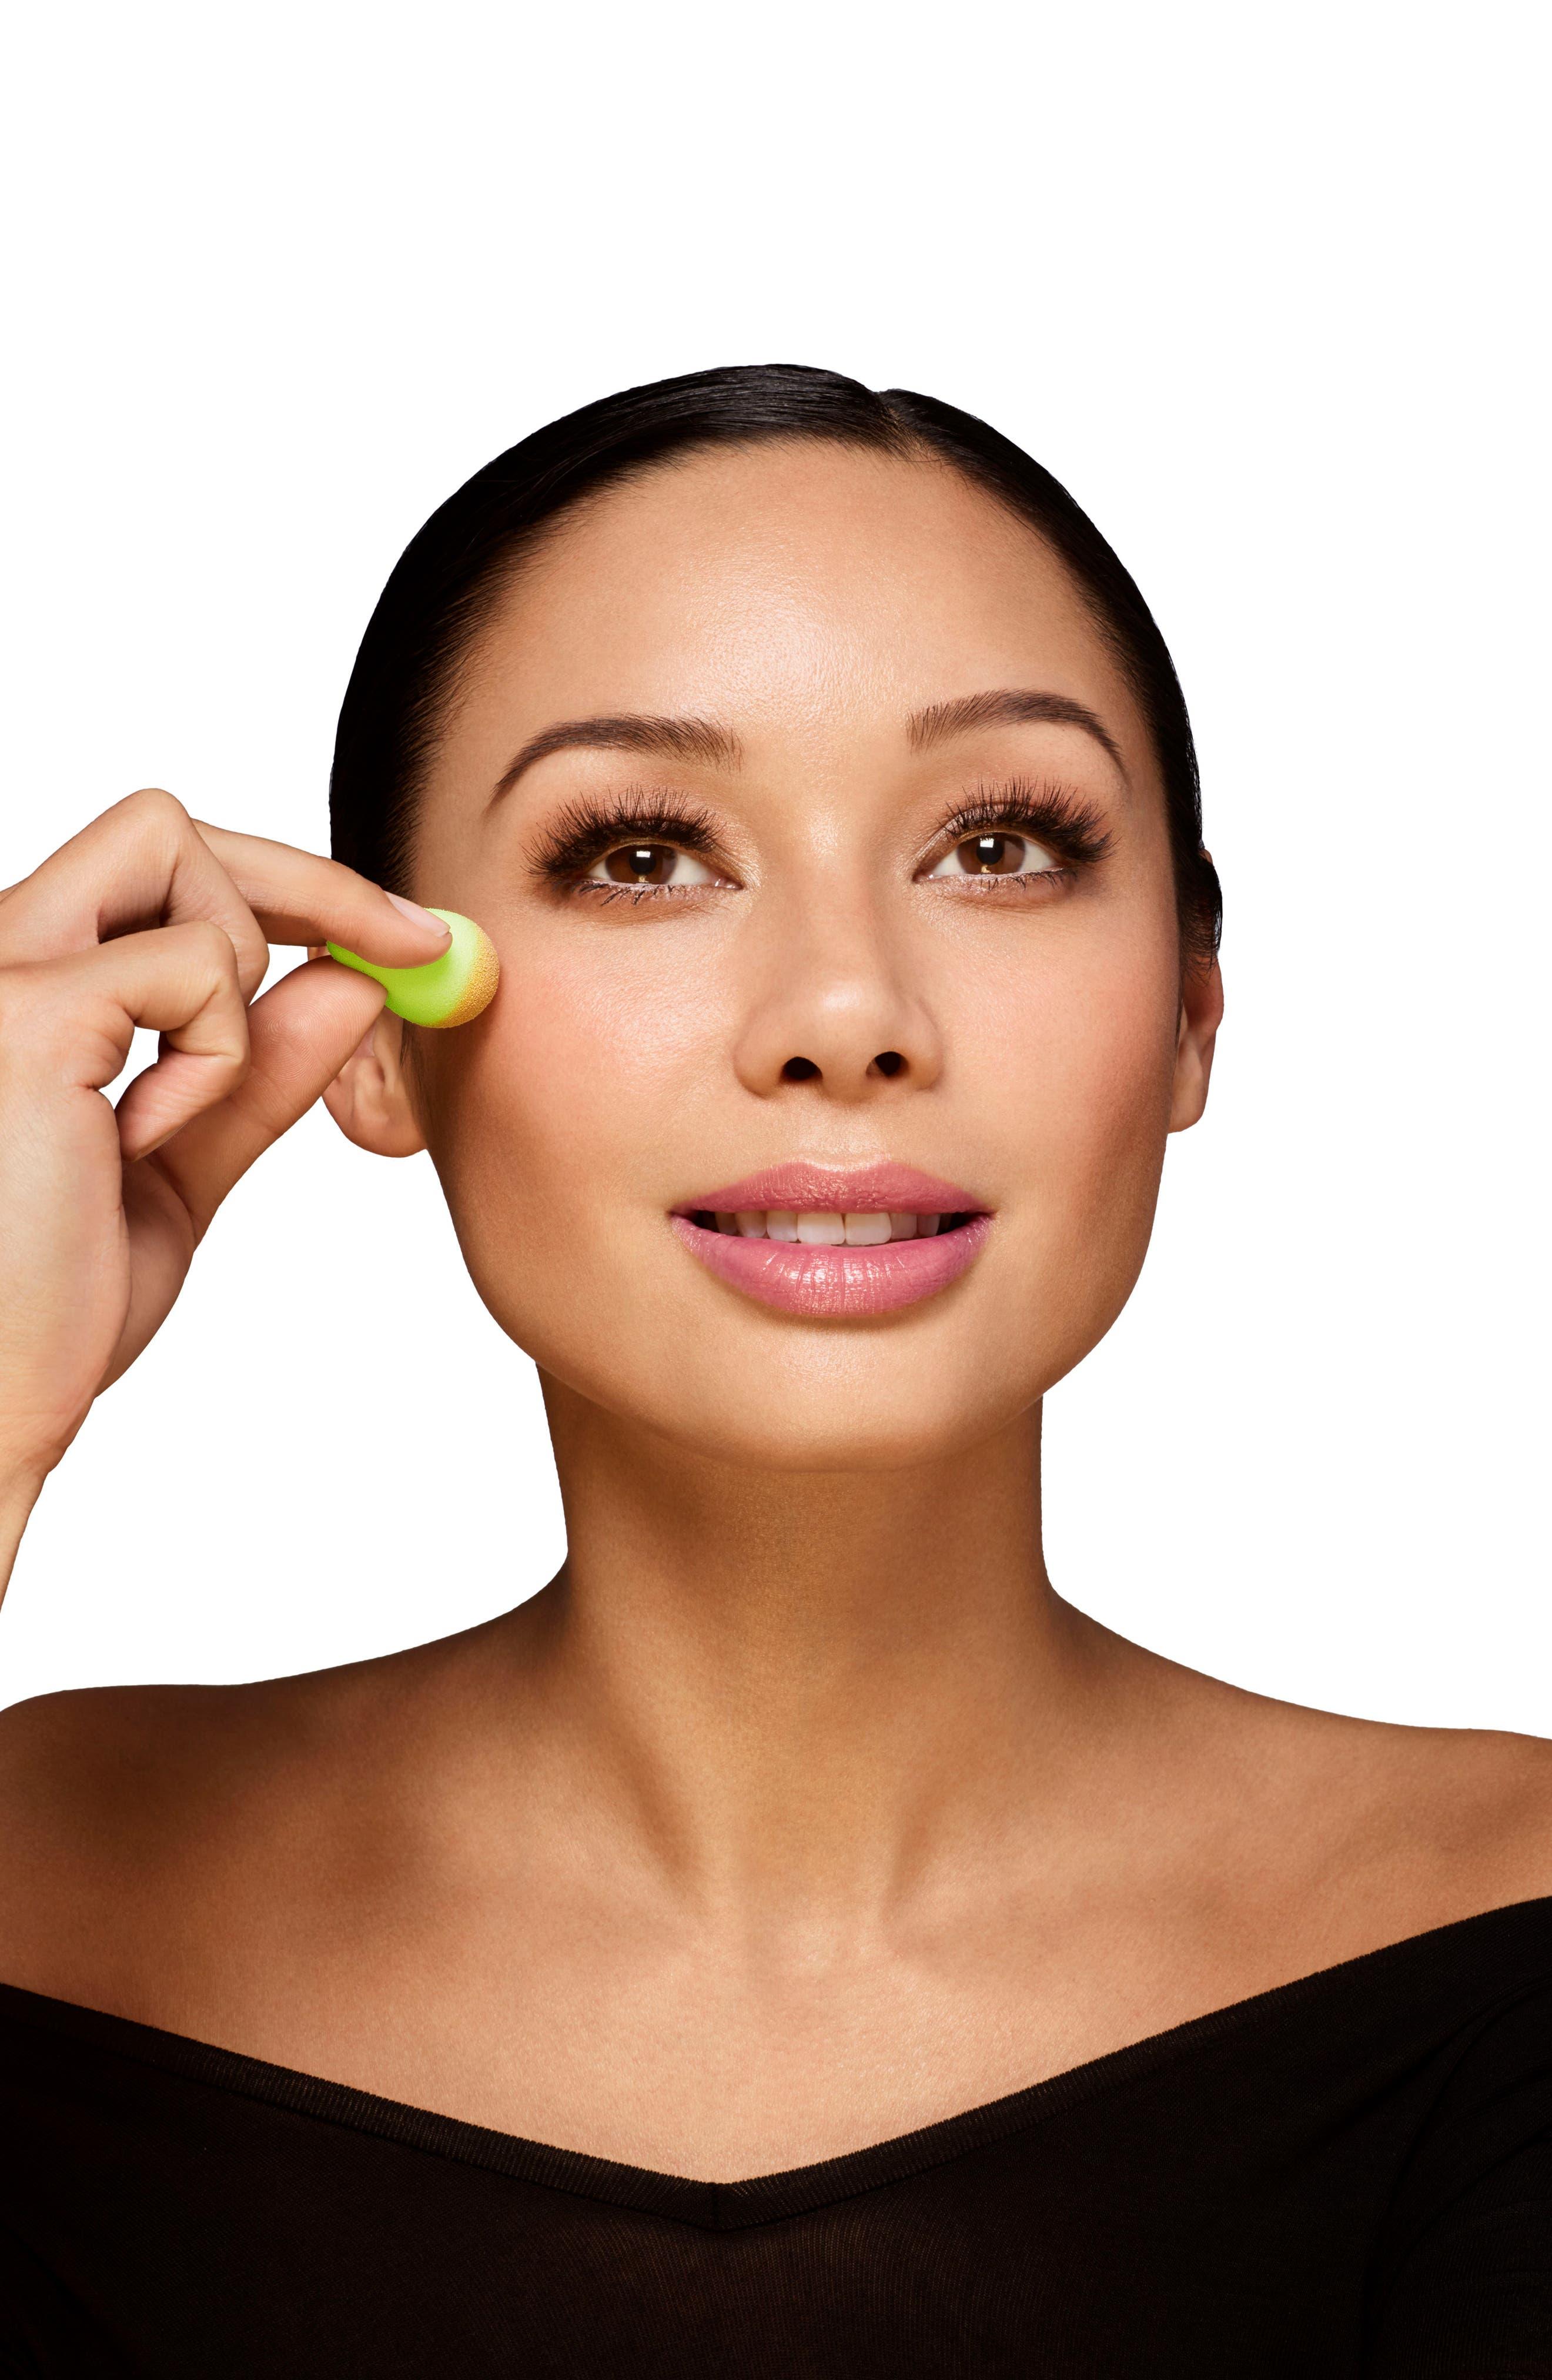 ,                             micro.mini Highlighting & Contouring Makeup Sponge Applicator,                             Alternate thumbnail 6, color,                             000